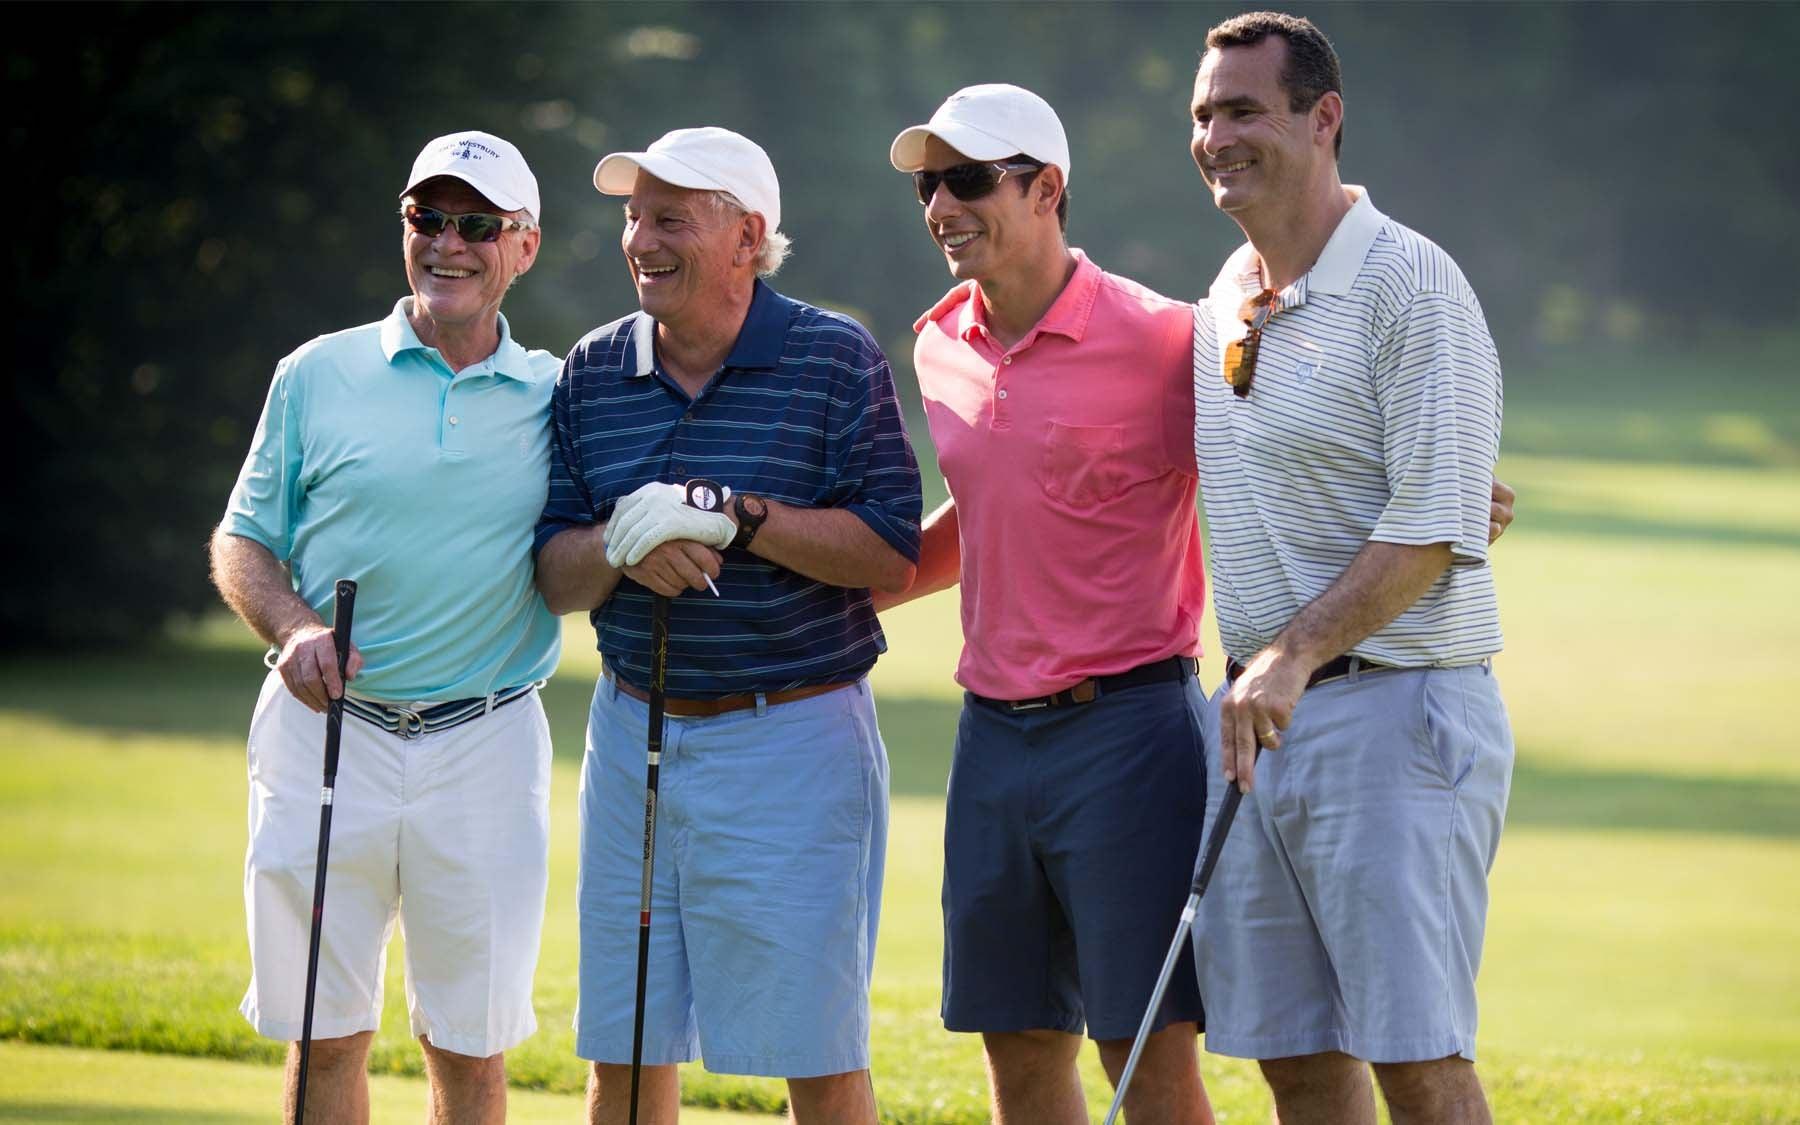 21st Annual Golf Tournament 2014